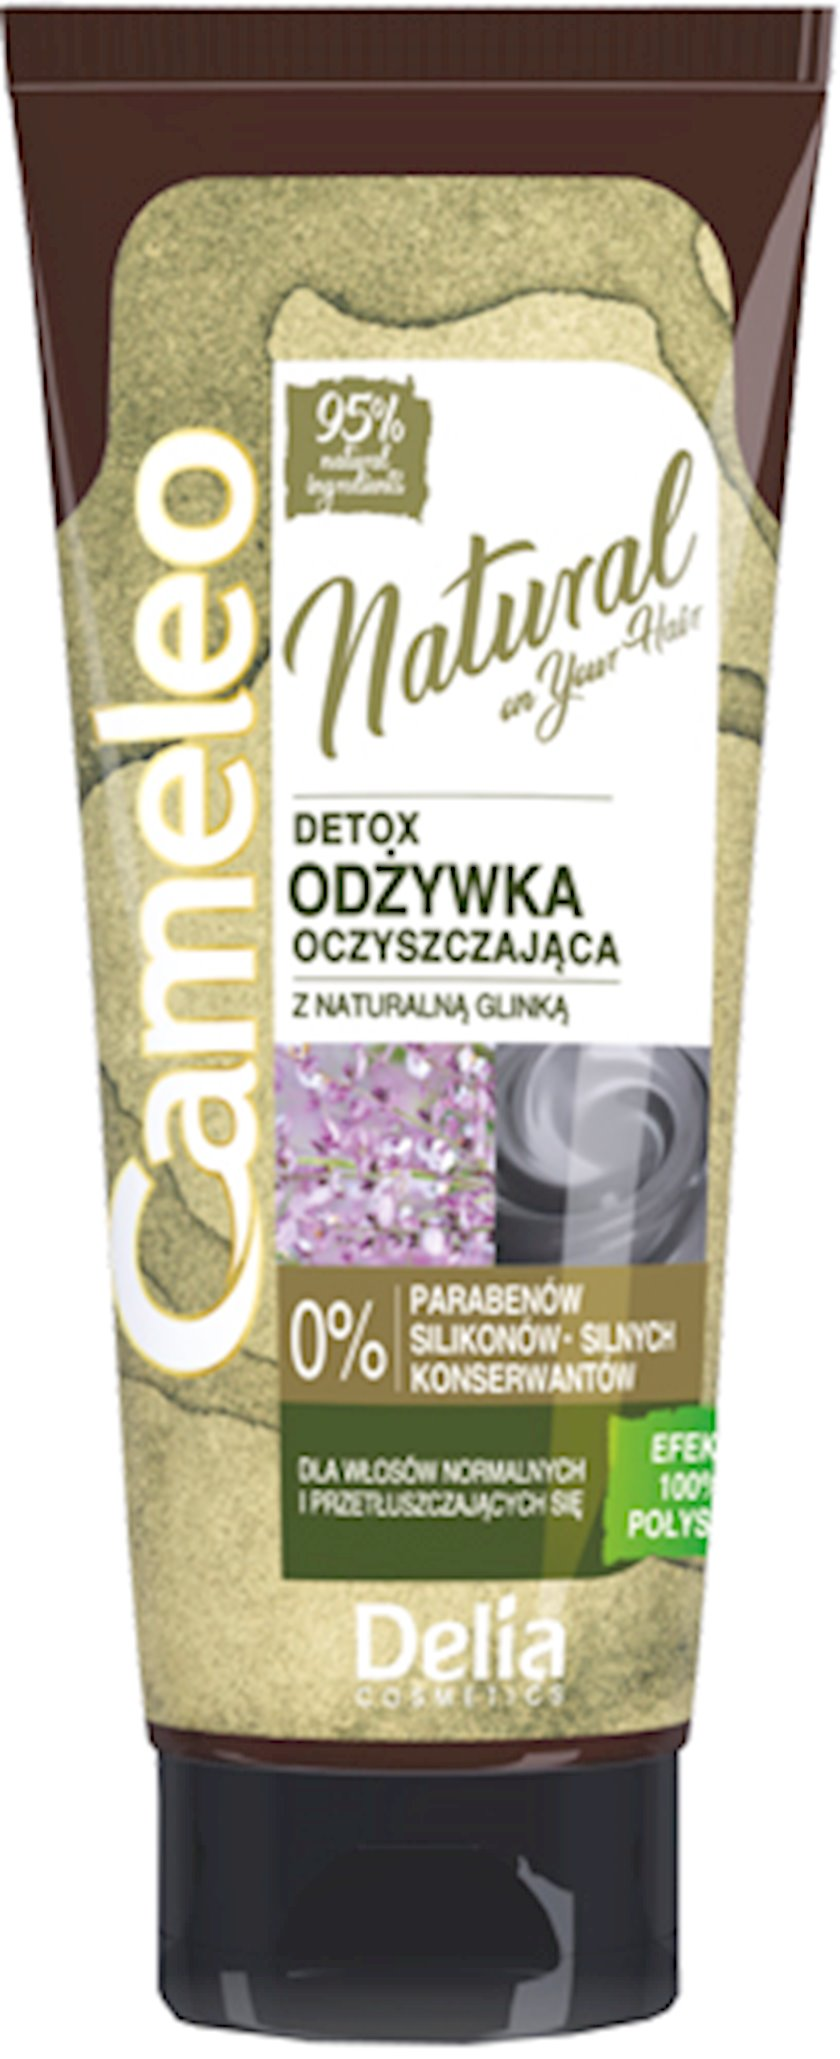 Saç kondisioneri Delia Cosmetics Cameleo Detox Təmizləyici  200 ml